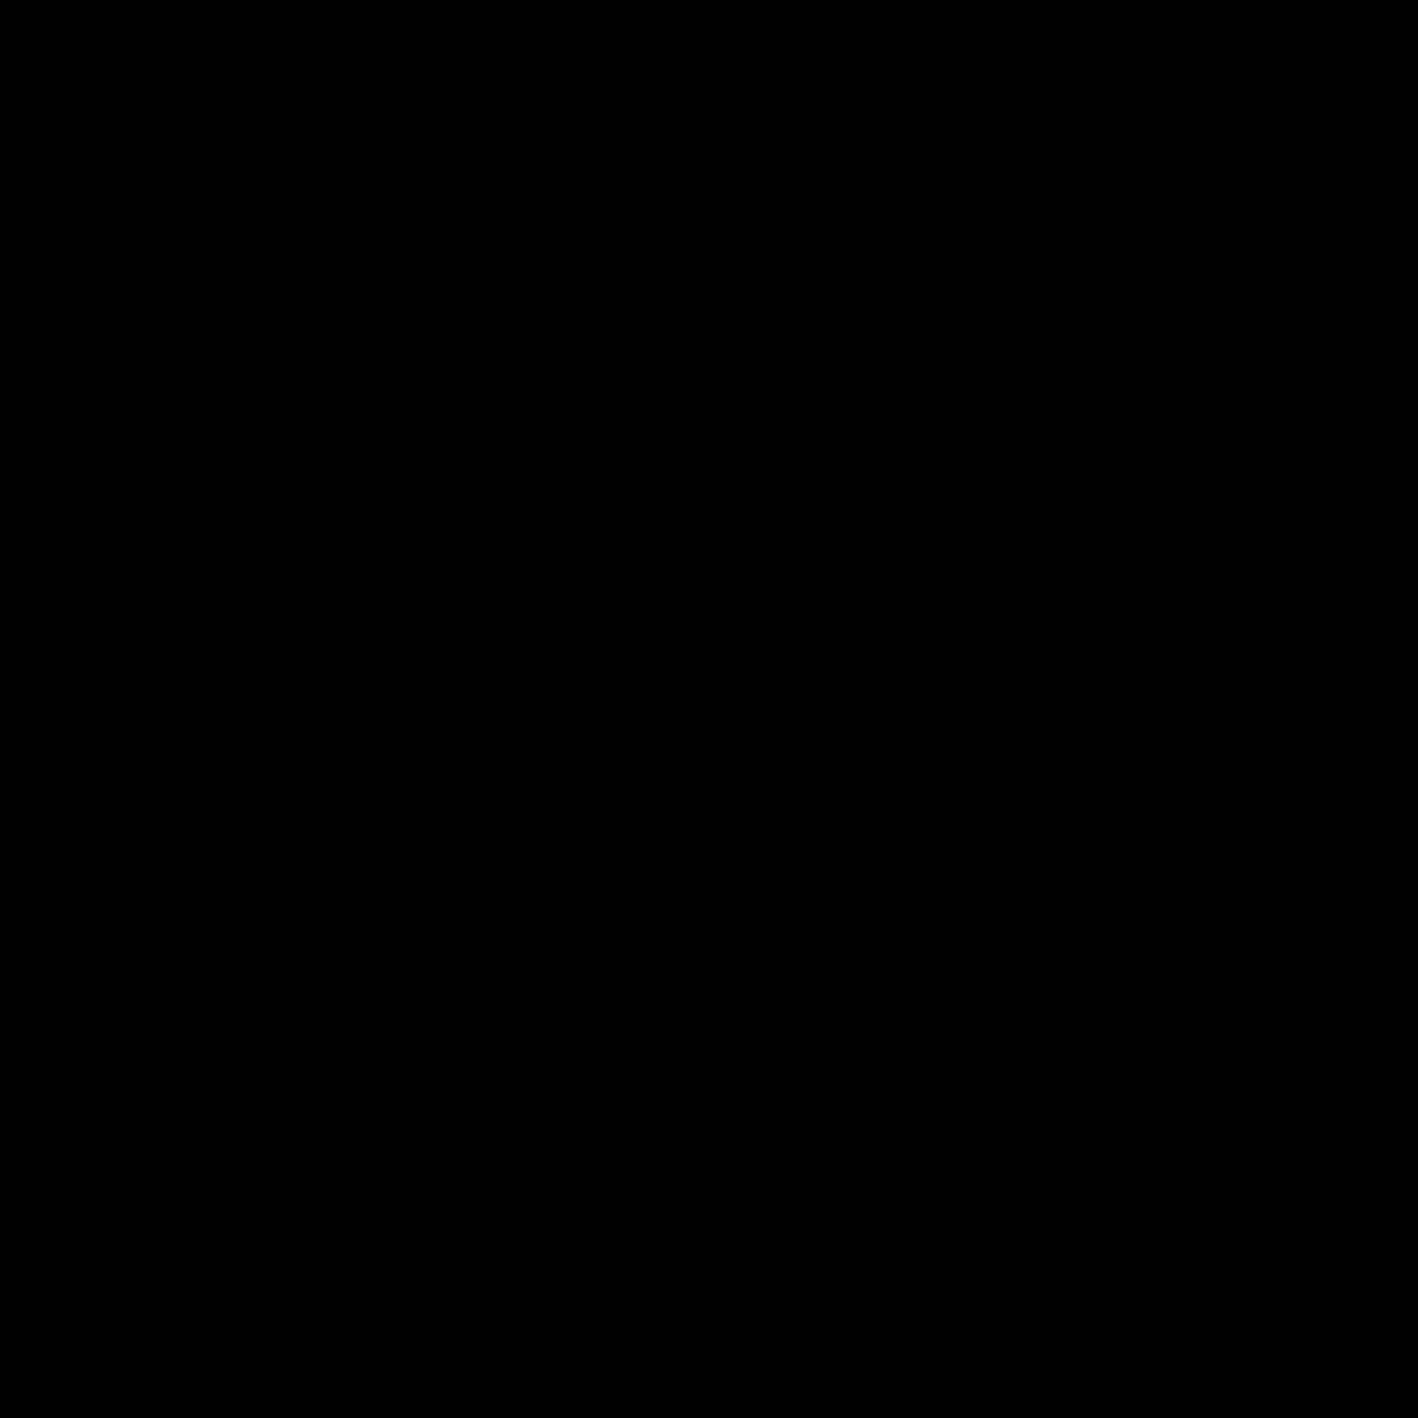 optima_logo (2)